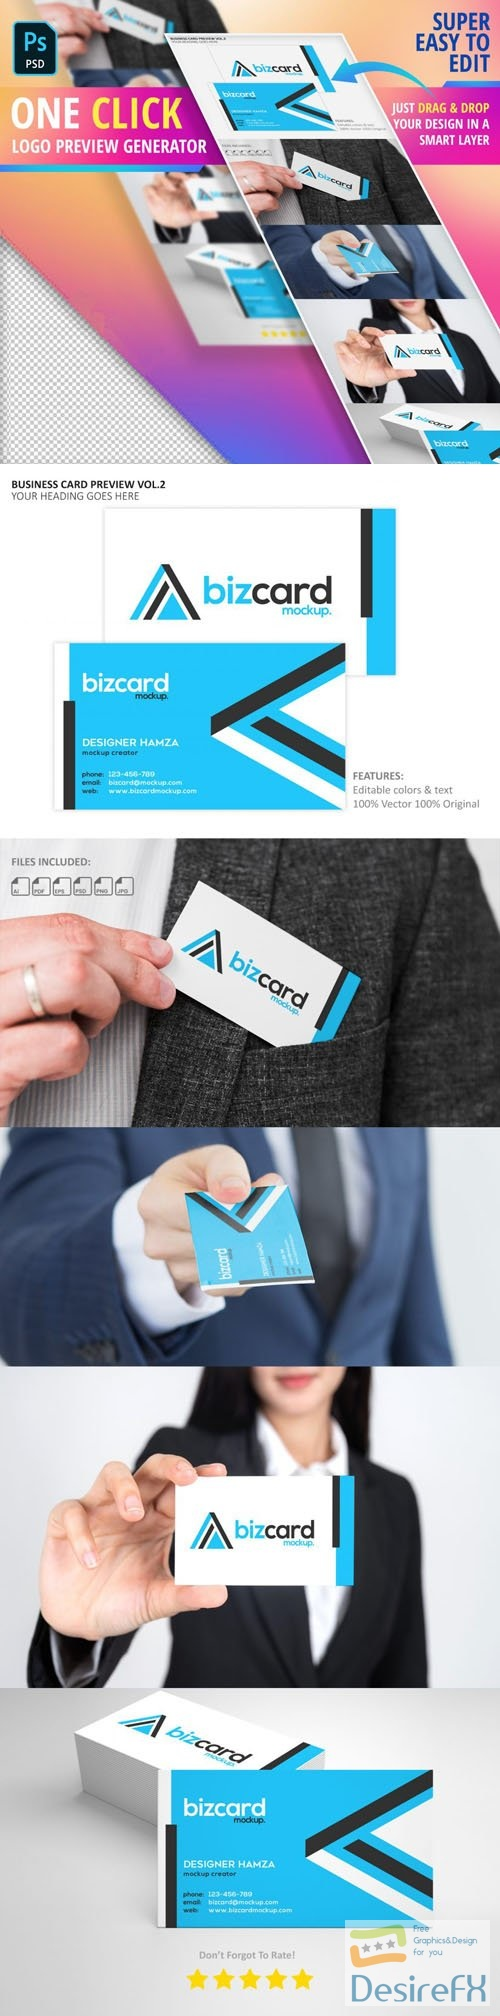 Business Card PSD Mockup - Logo Preview Generator